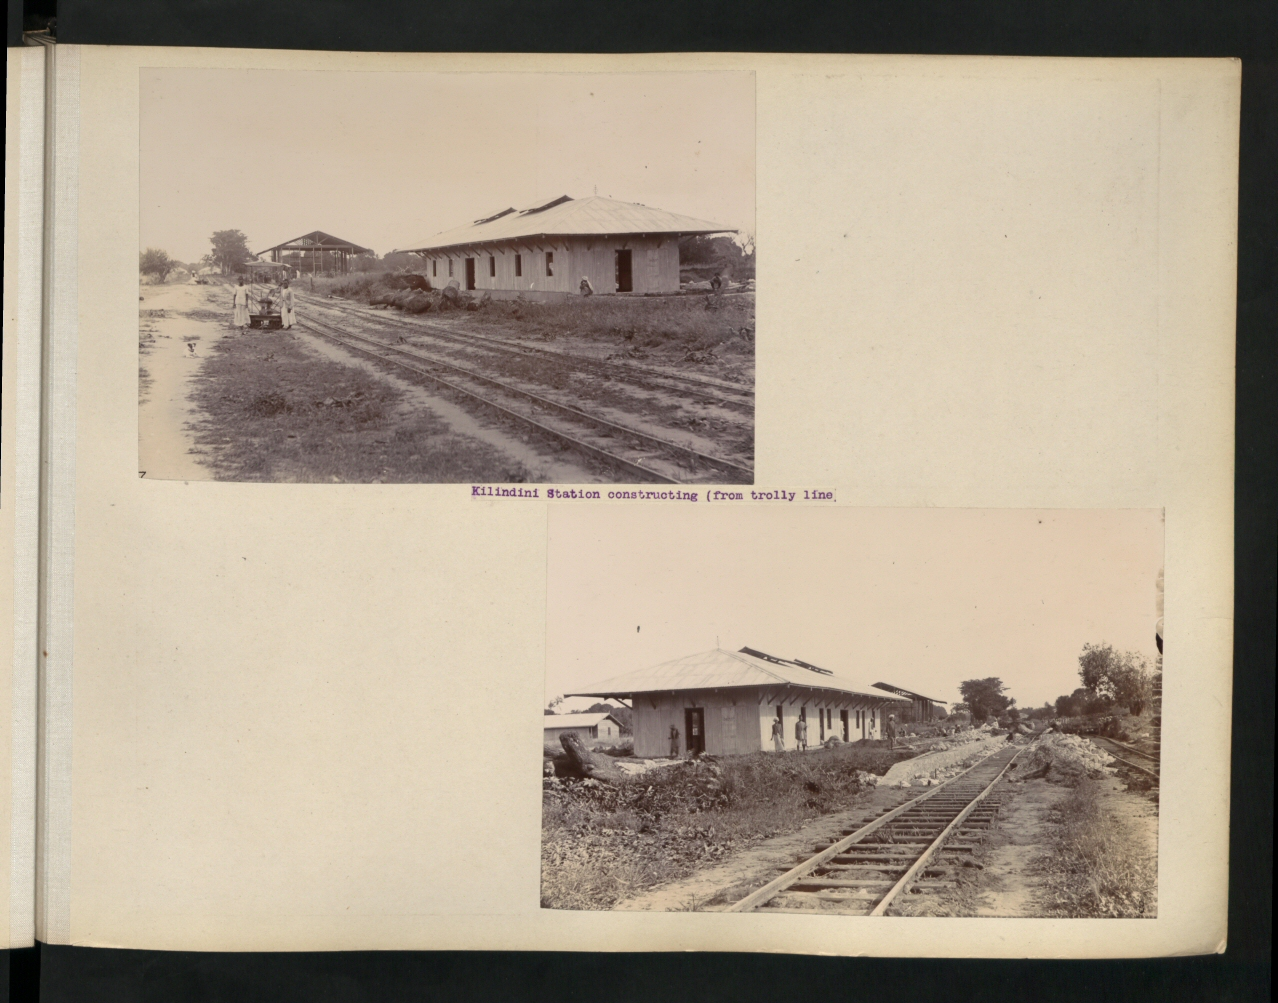 CO 1069-185-64